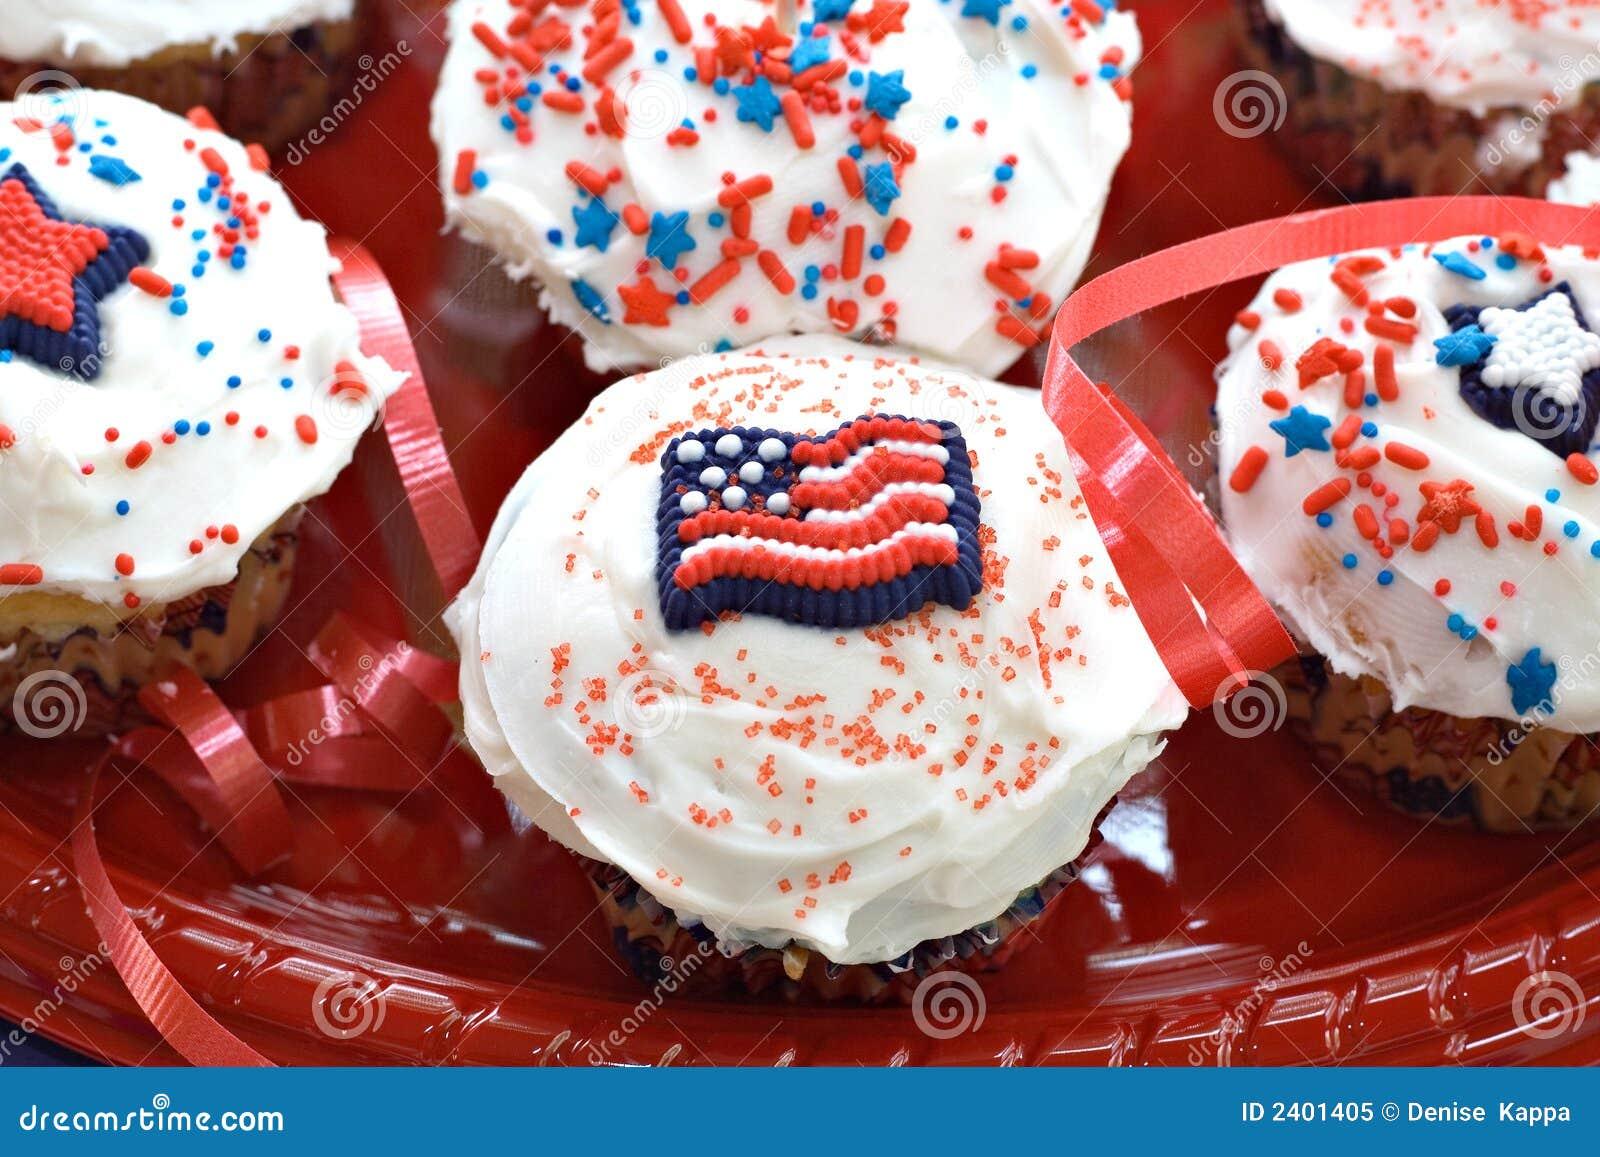 American Holiday Dessert